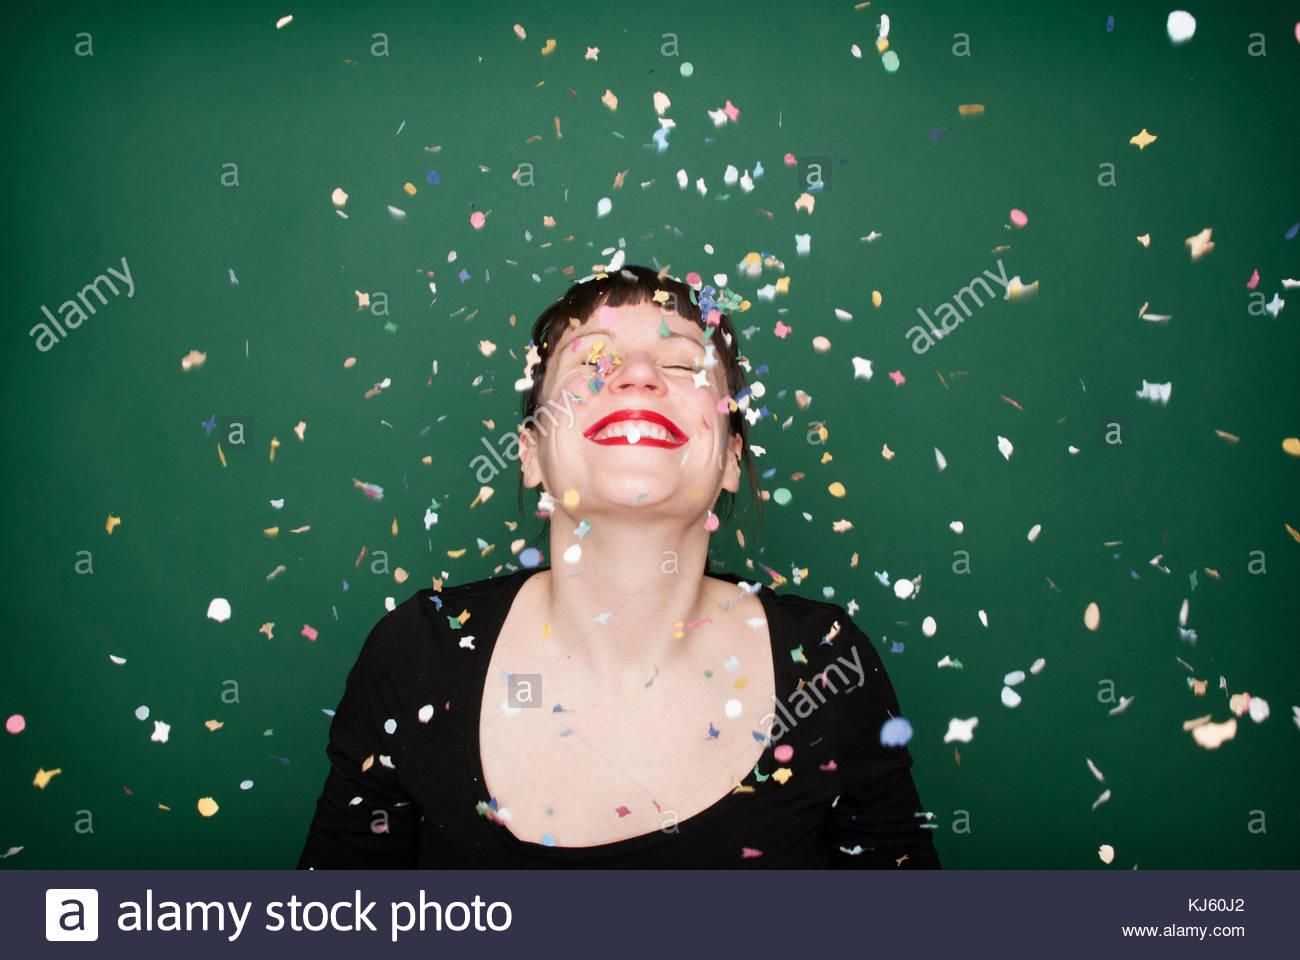 Happy woman with confetti - Stock Image